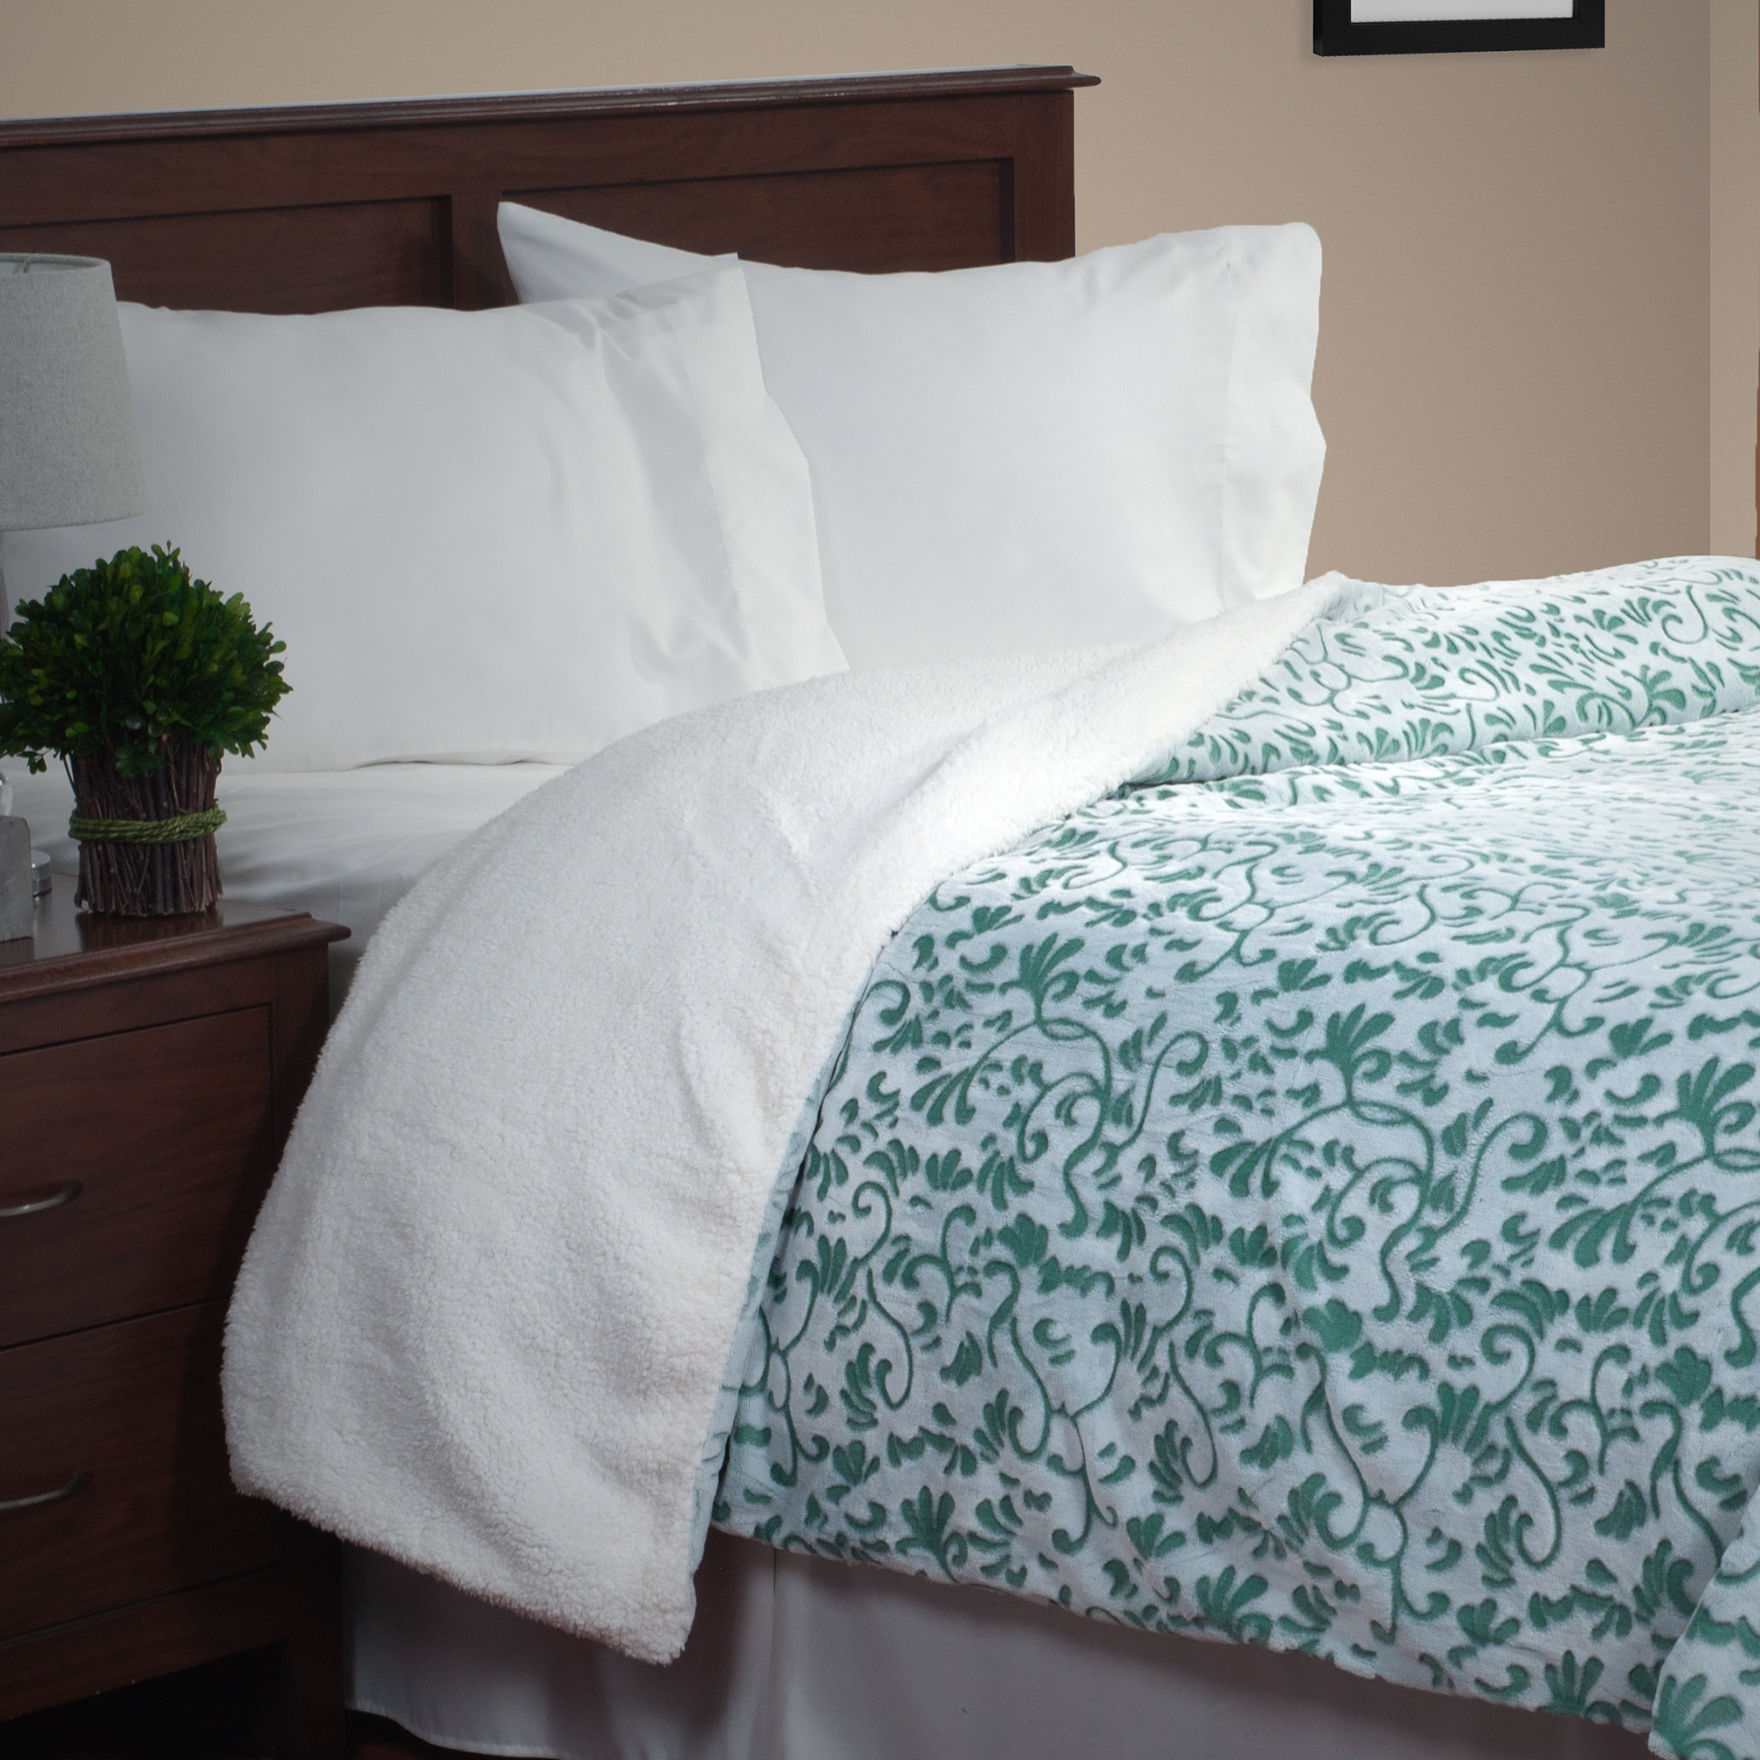 Lavish Home Green Blankets & Throws